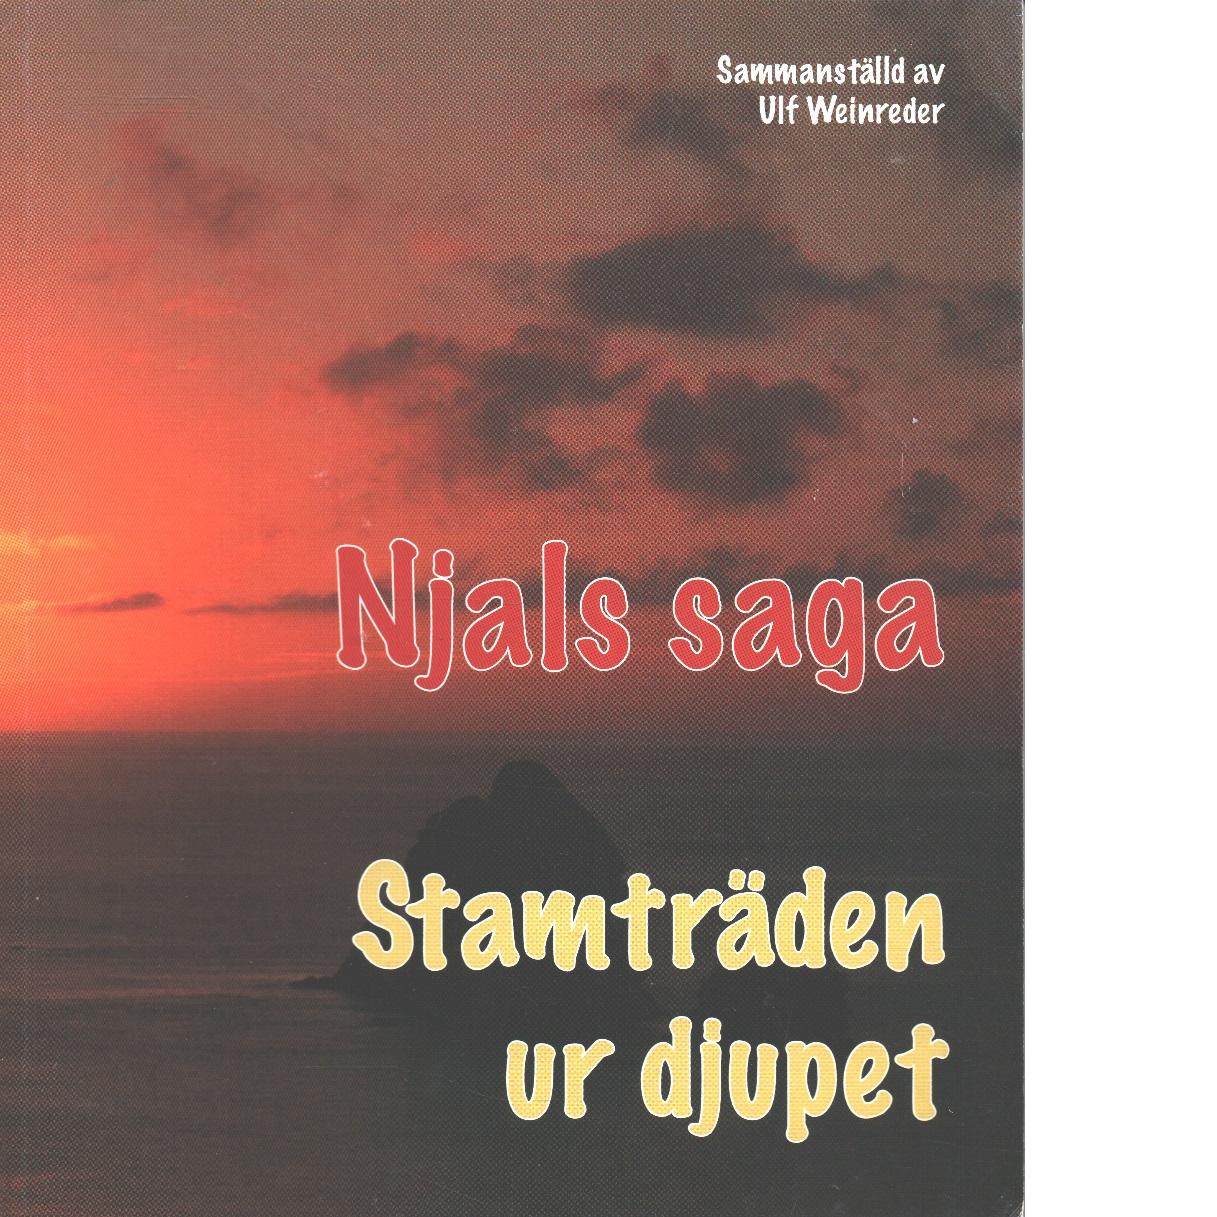 Njals saga : stamträden ur djupet - Weinreder, Ul